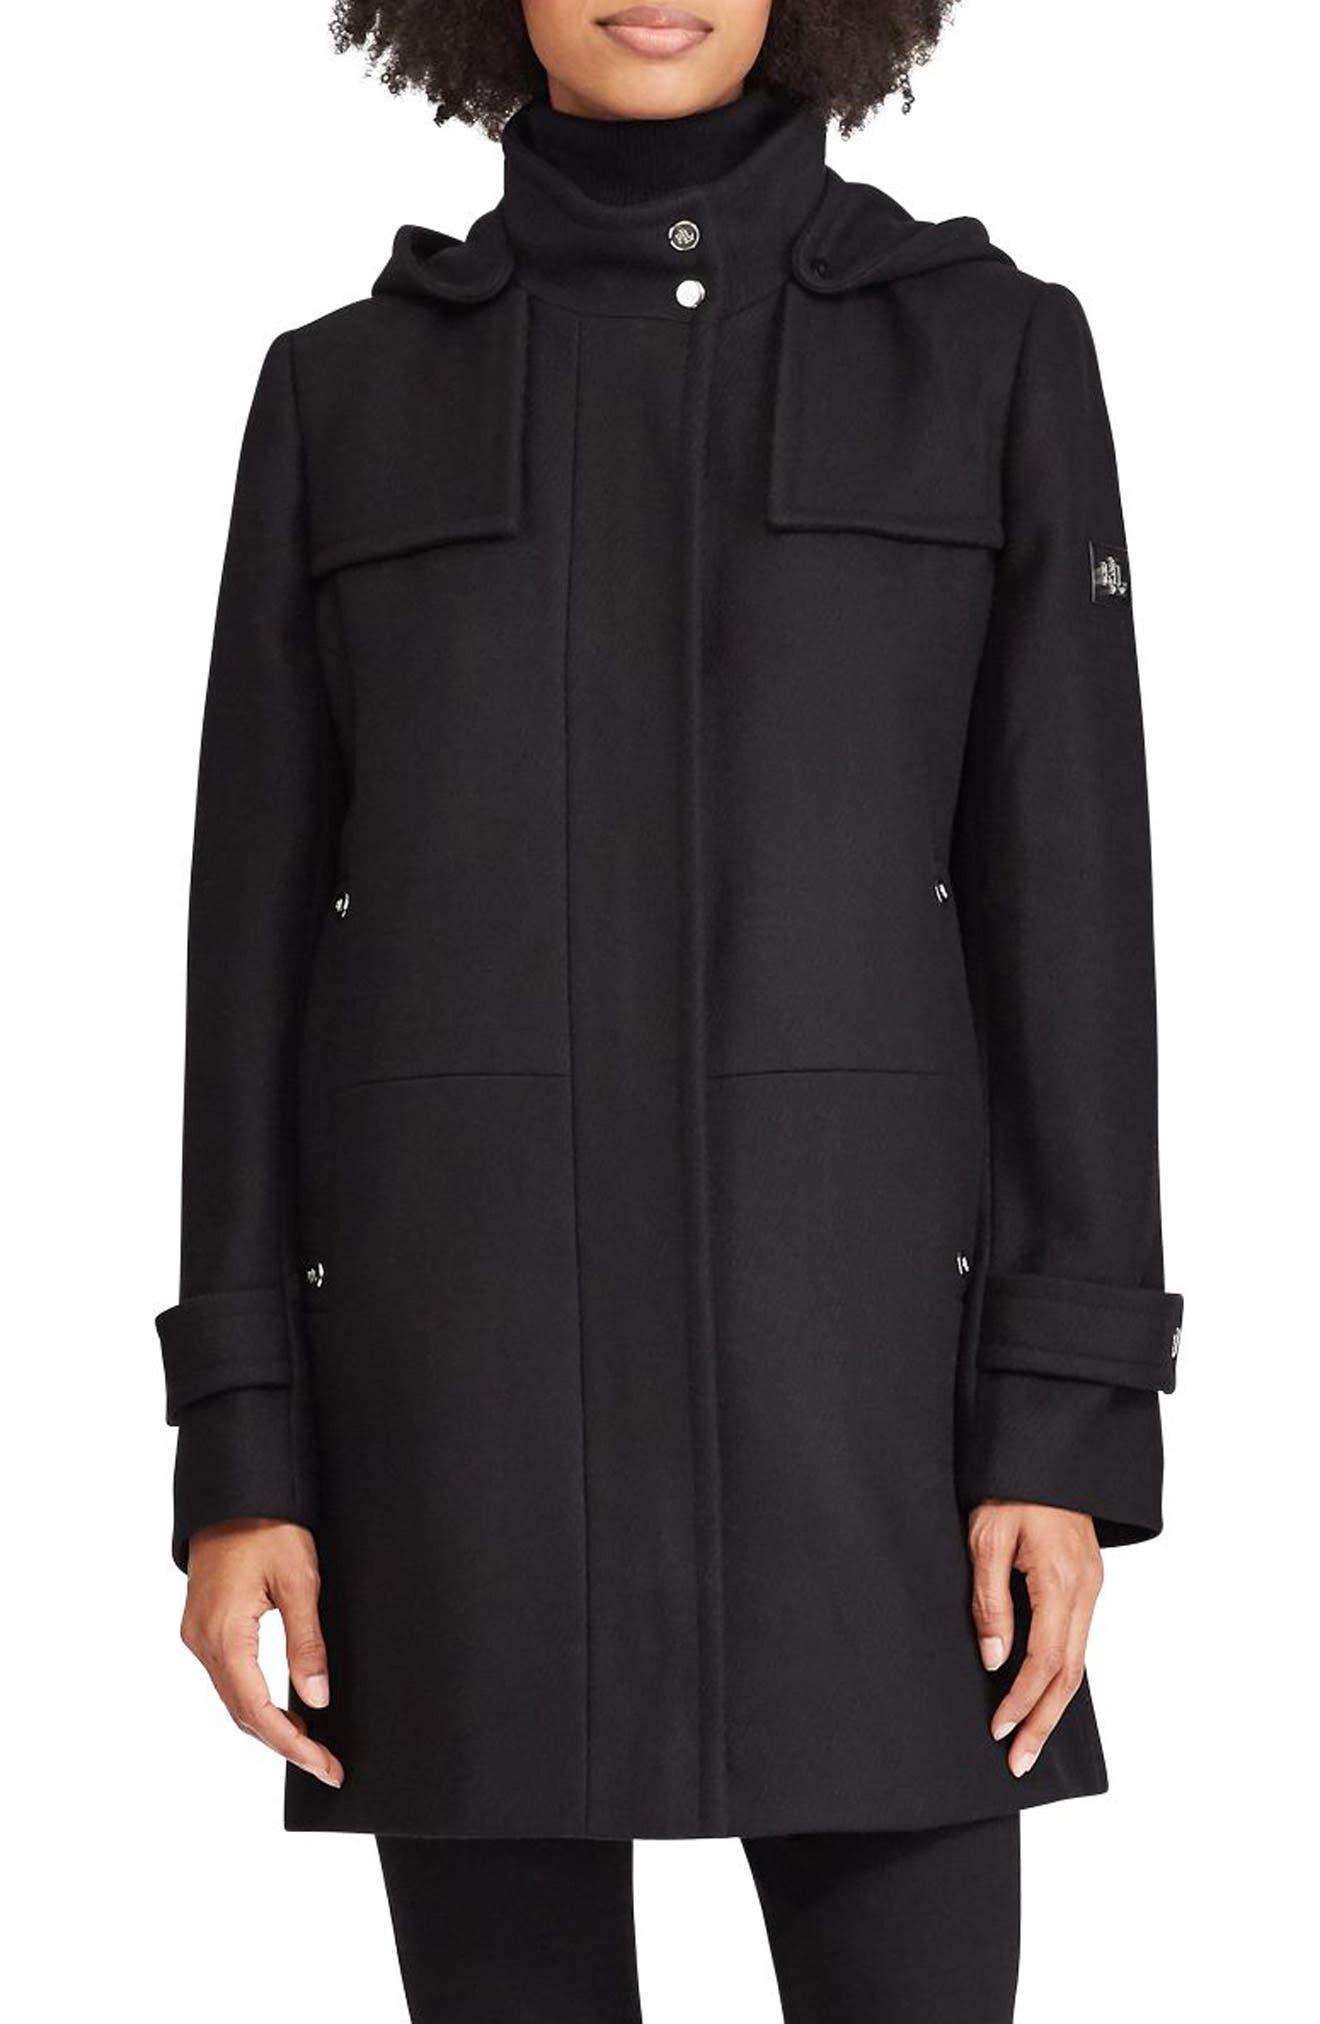 LAUREN RALPH LAUREN, Wool Blend Jacket, Main thumbnail 1, color, BLACK